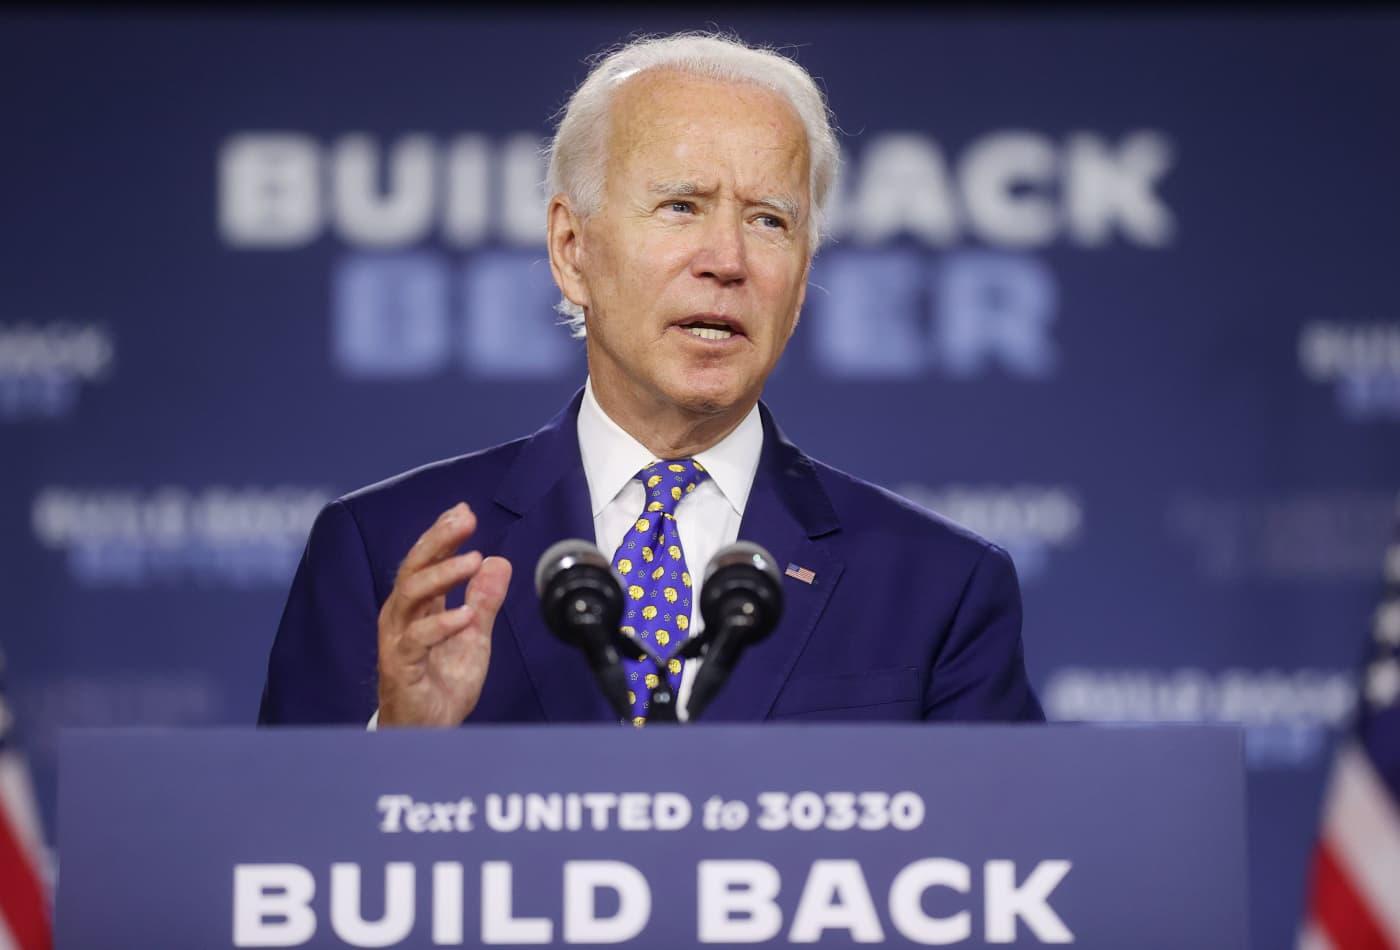 Joe Biden says Trump's failure to lead is responsible for historic economic slump